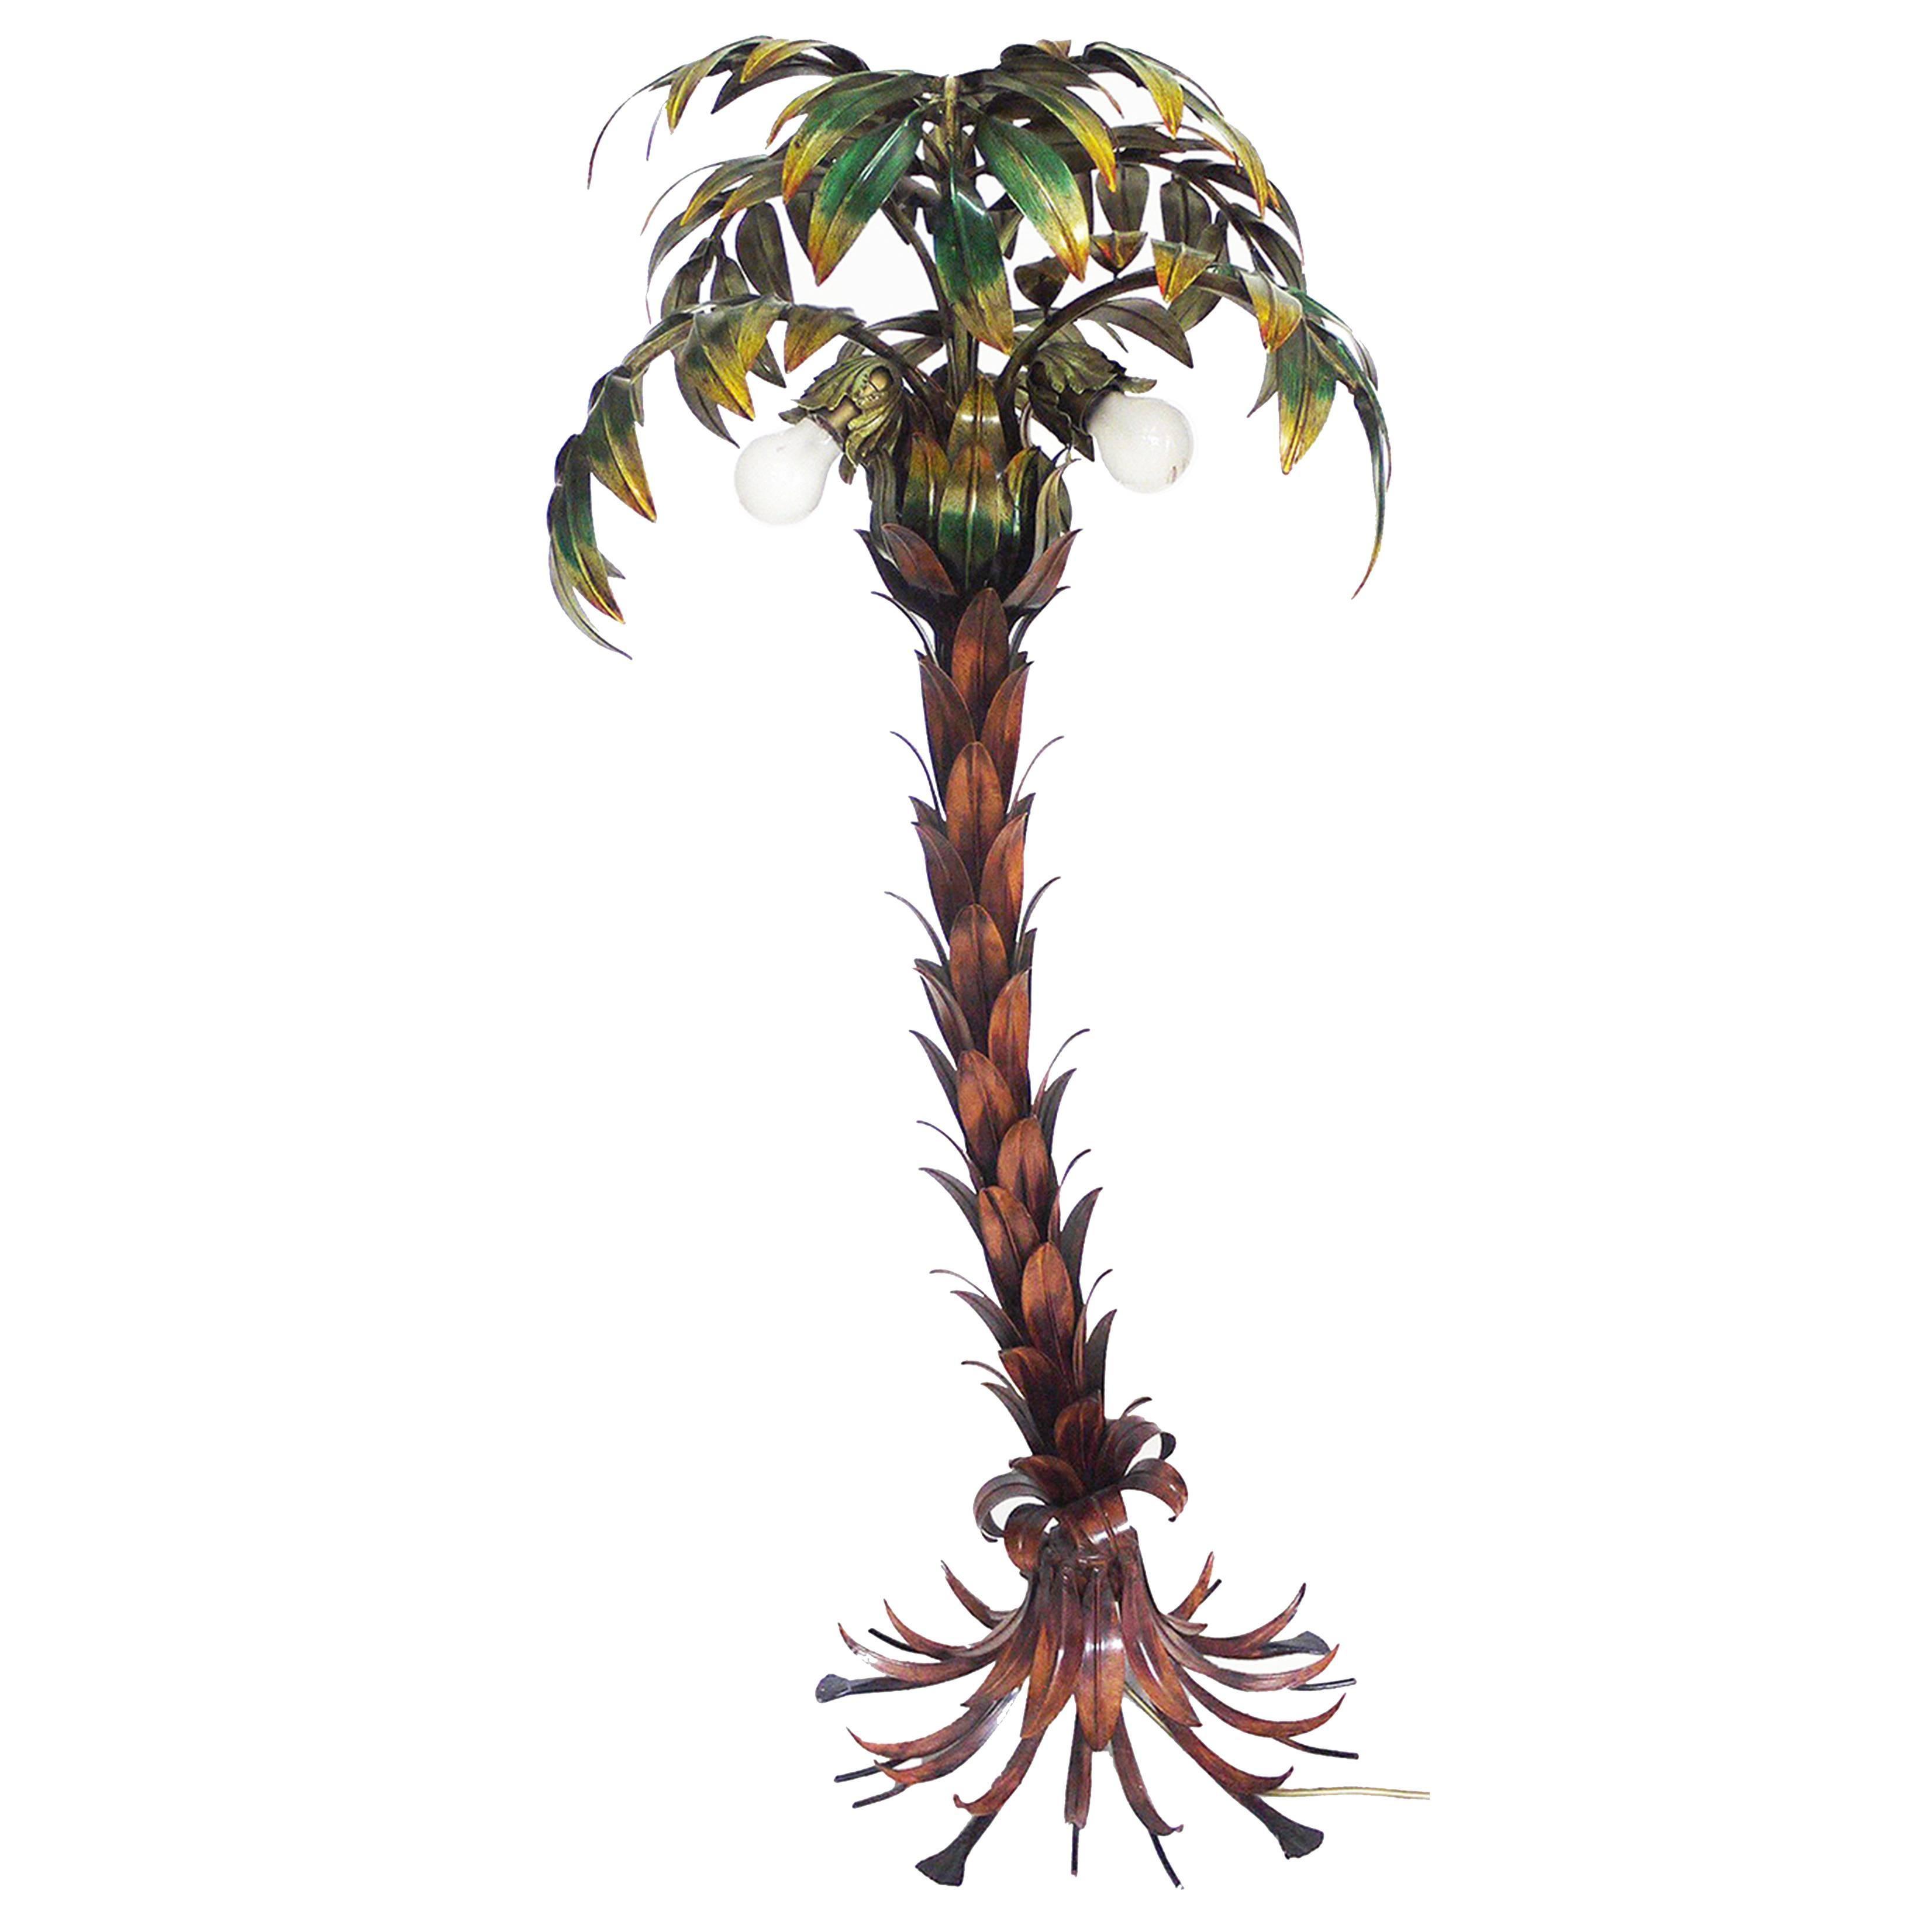 Hans Kogl Palm Tree Floor Lamp Limited Edition Polychrome Metal, Germany, 1970s